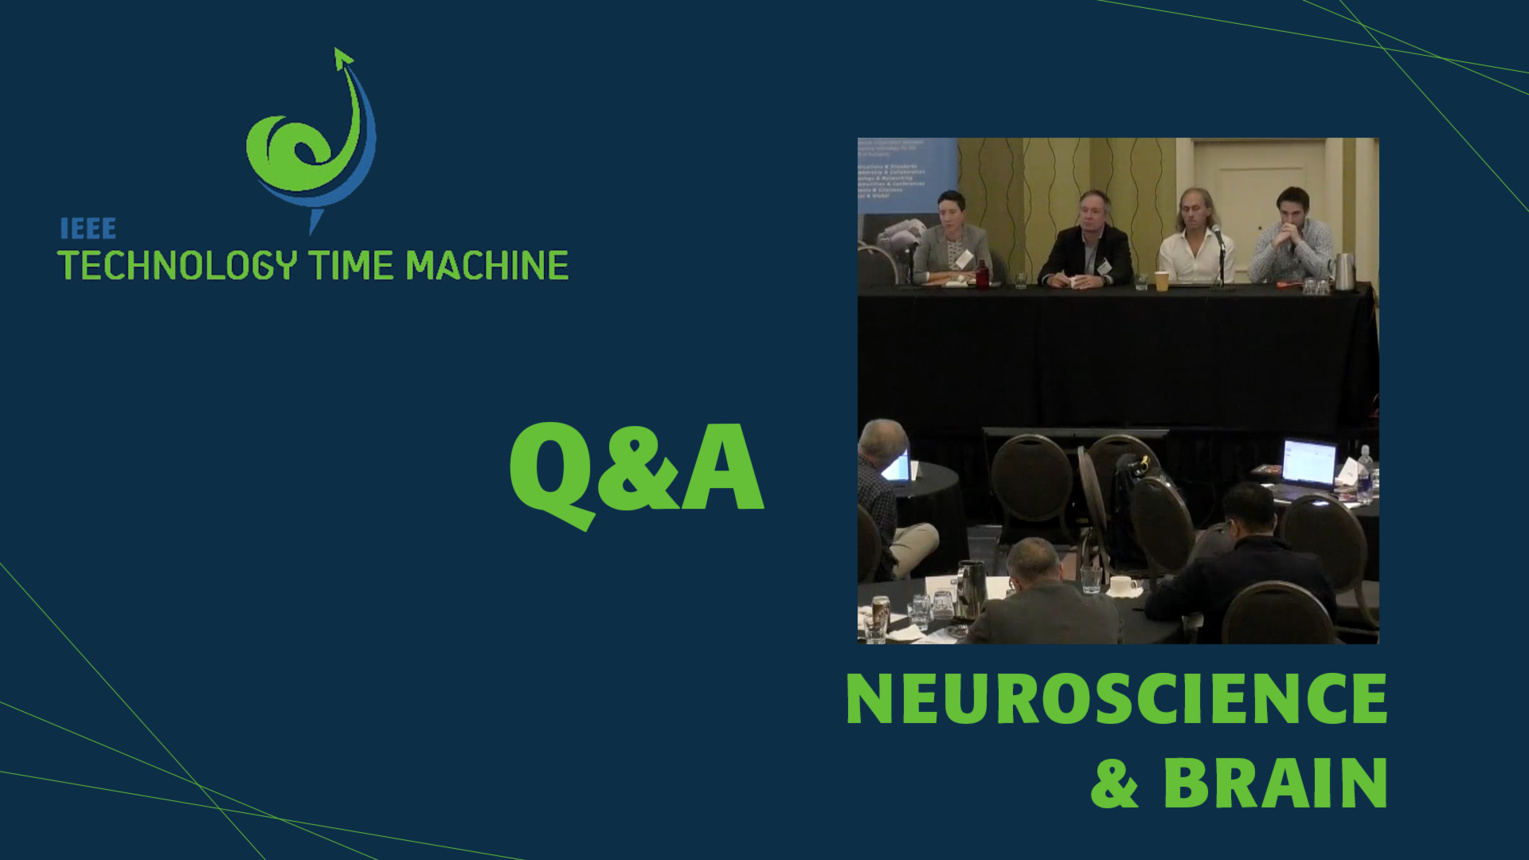 Q&A: Neuroscience and Brain Panel - TTM 2018